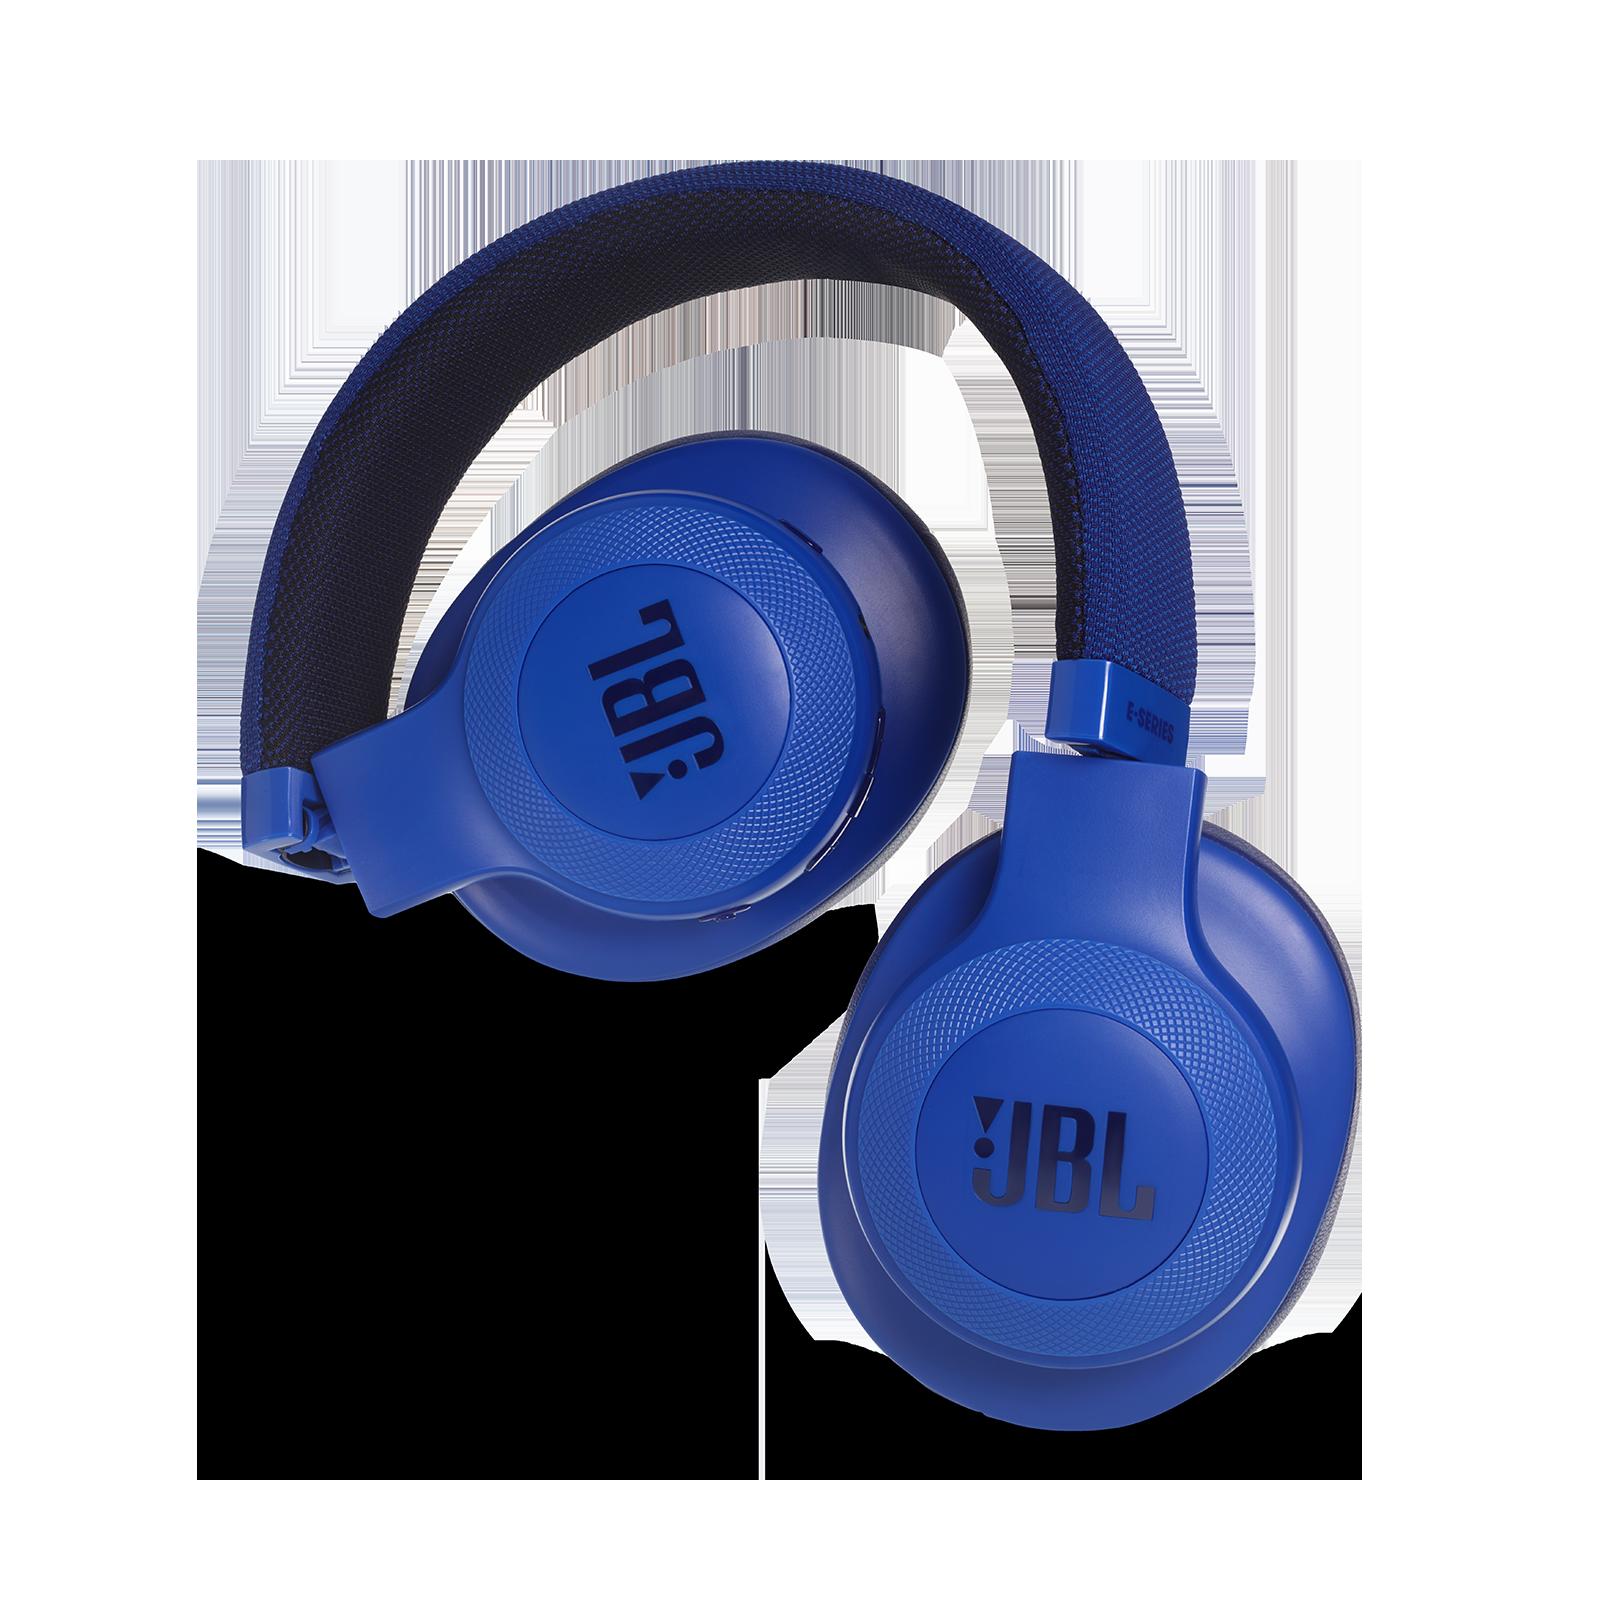 JBL E55BT - Blue - Wireless over-ear headphones - Detailshot 1